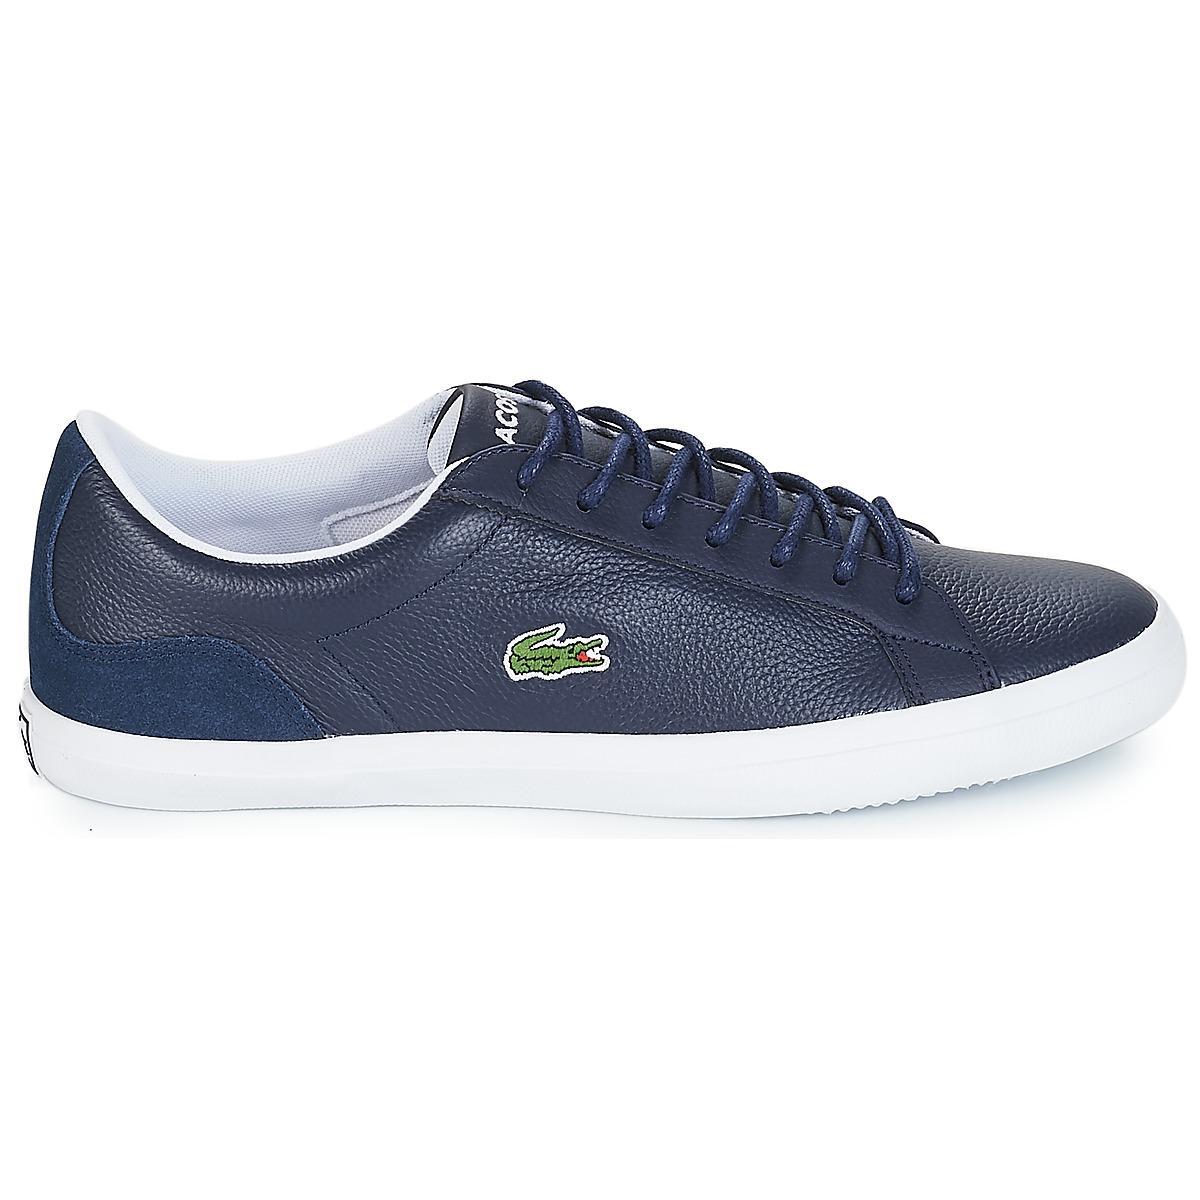 0dfa2ecf9d90 Lacoste - Blue Lerond 318 3 Shoes (trainers) for Men - Lyst. View fullscreen